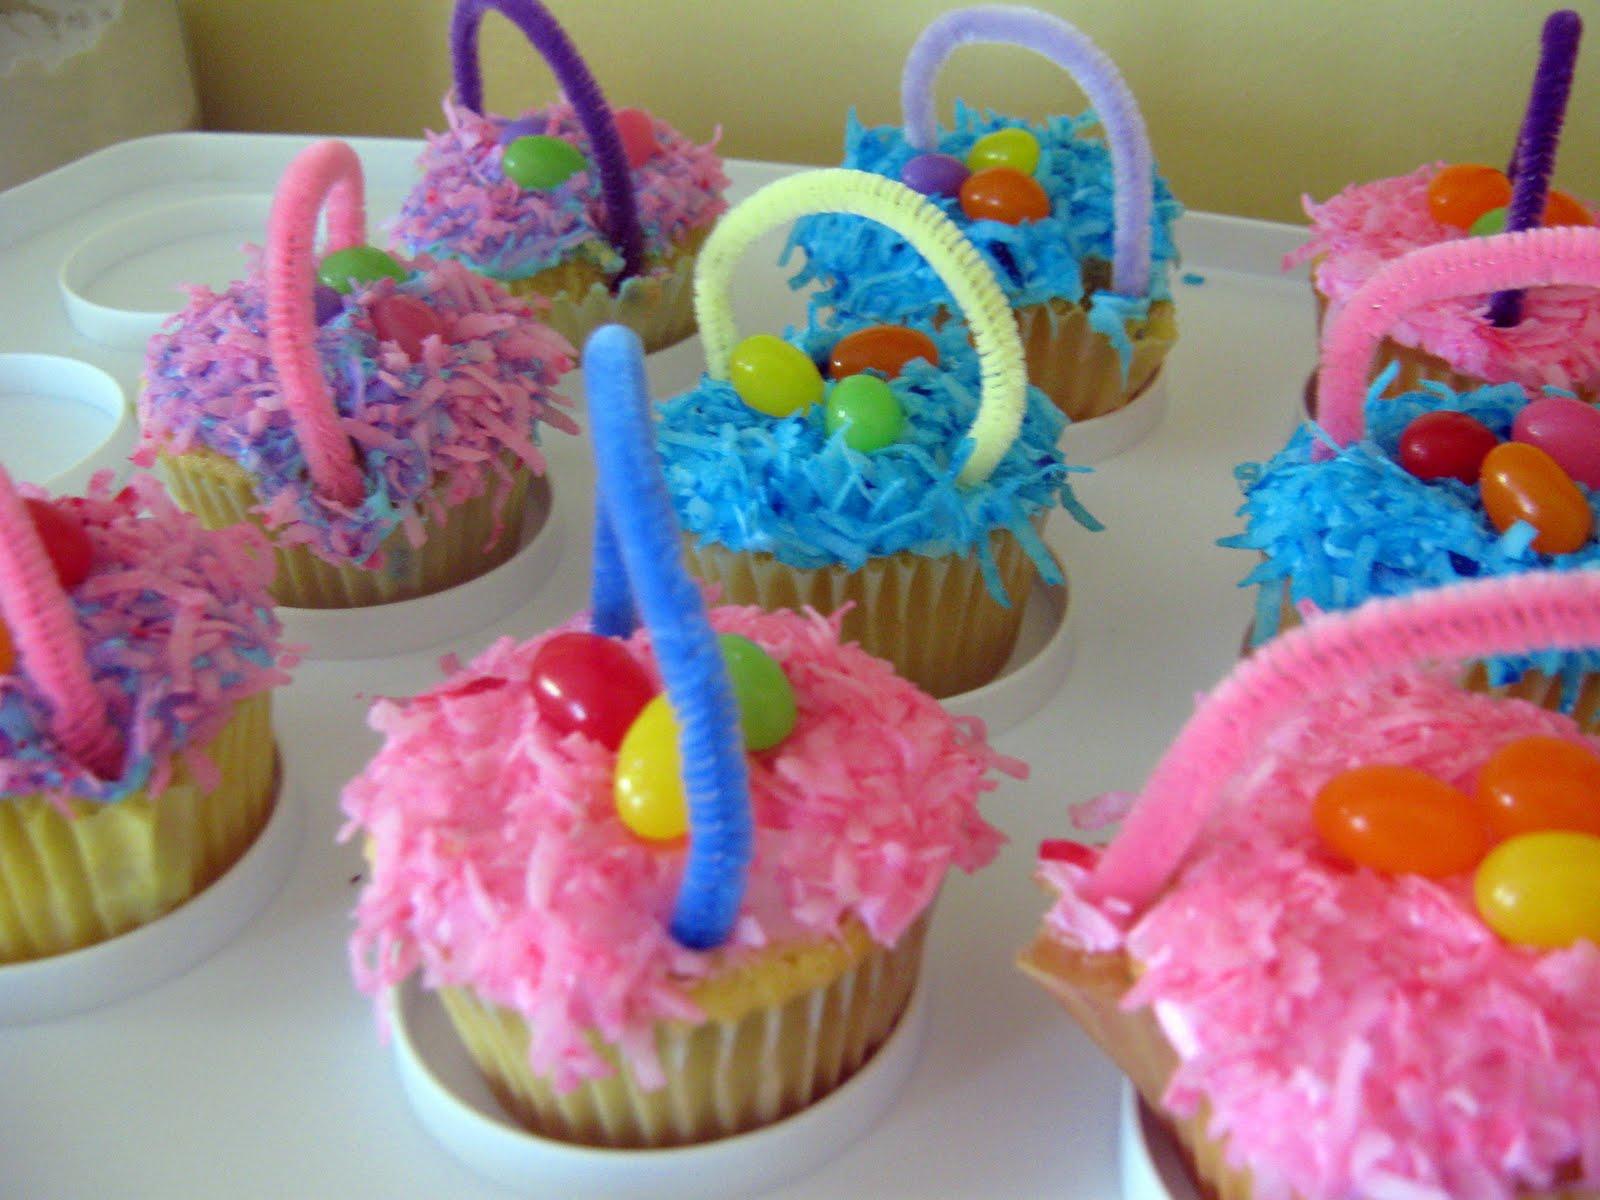 Handmade Easter Baskets Ideas : Home made modern easter basket cupcakes and someday egg